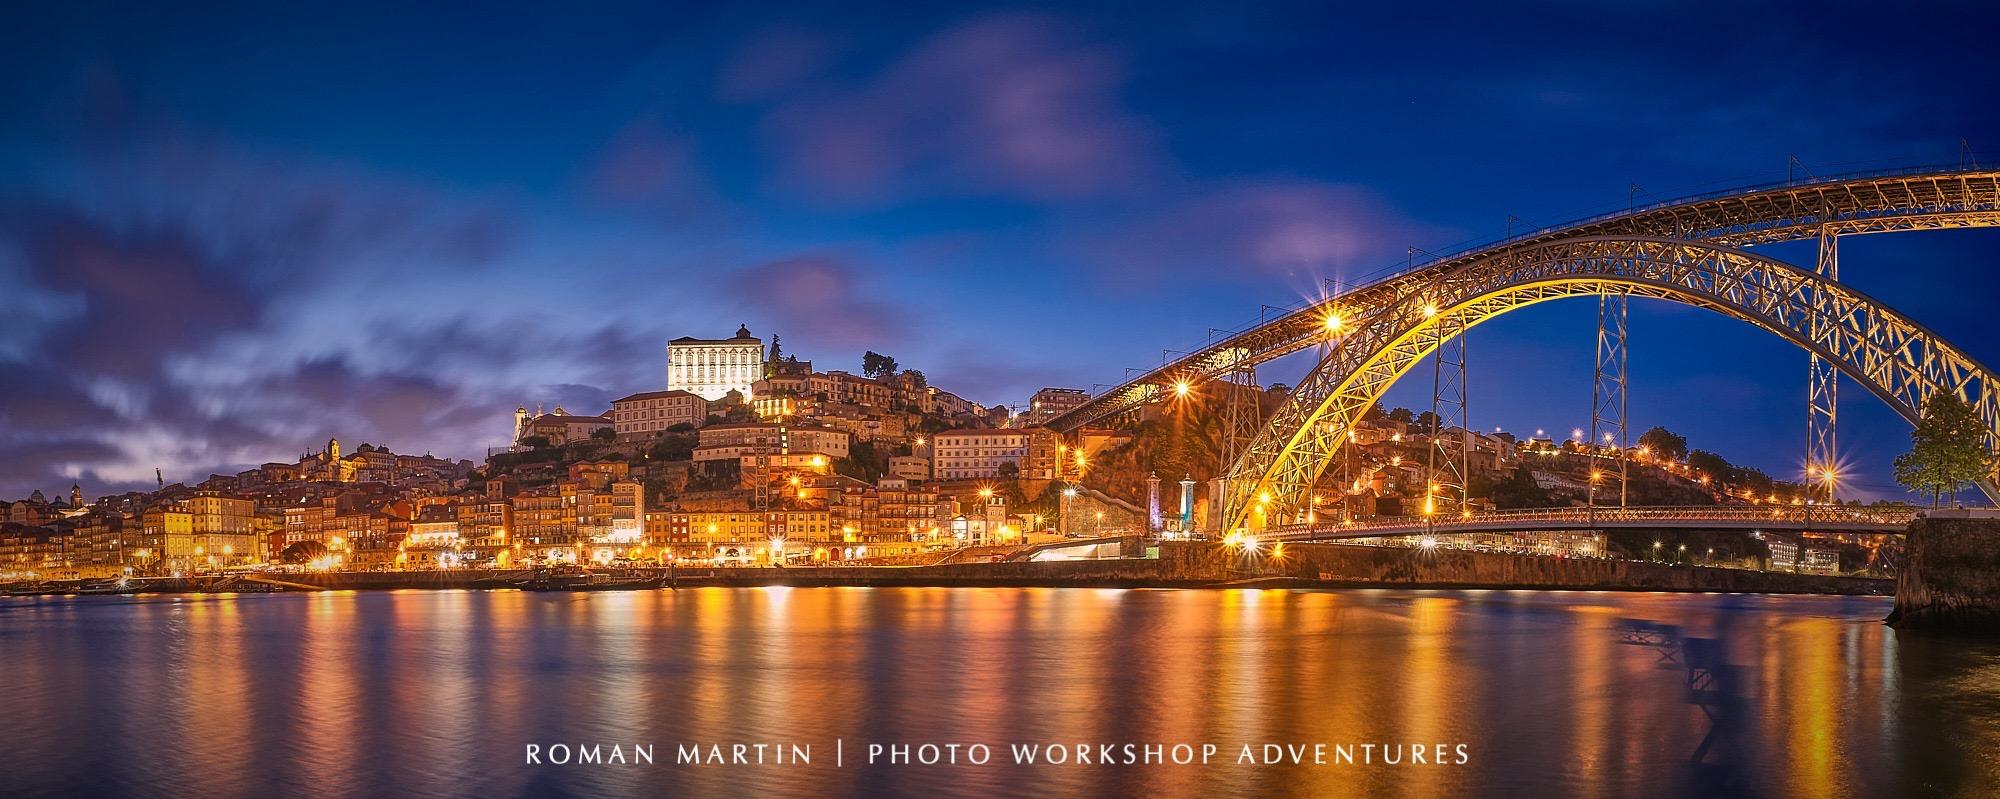 Under the bridge, Portugal